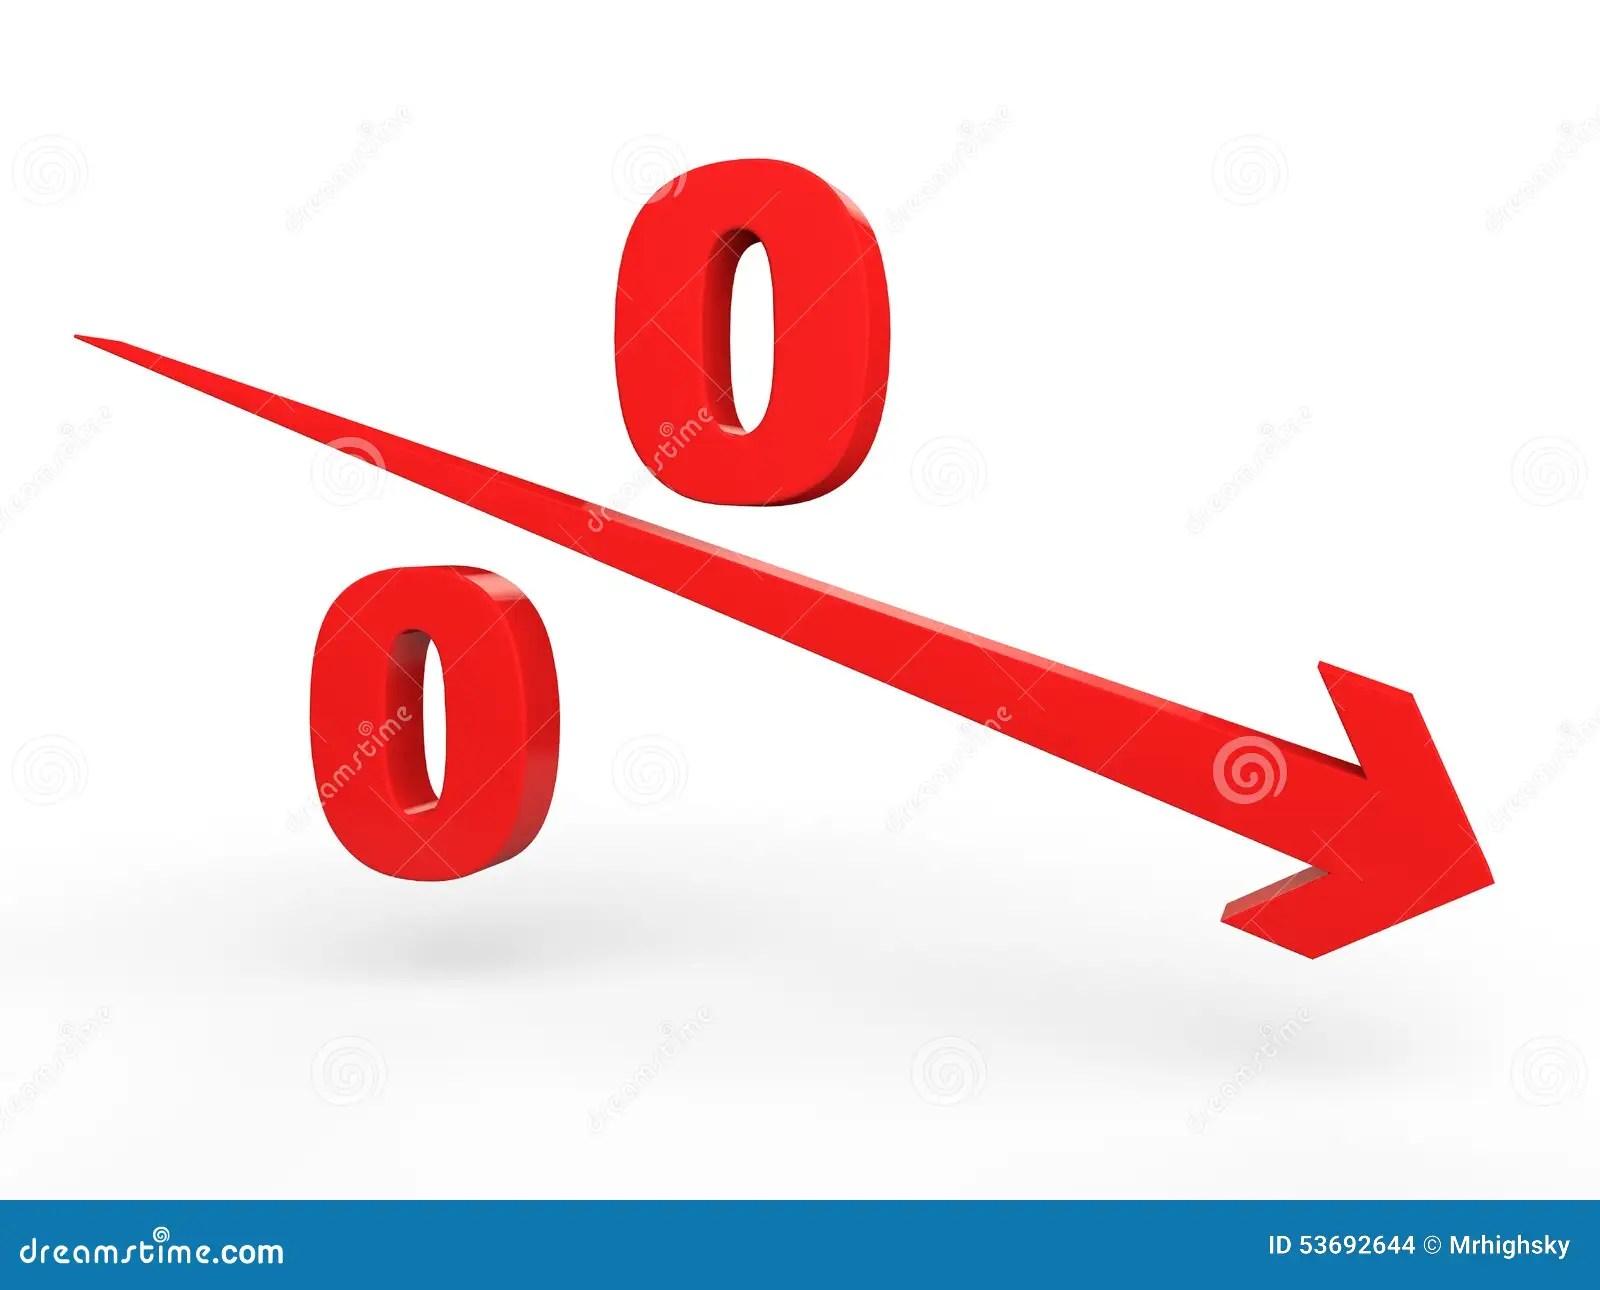 Percentage Decrease Concept Stock Illustration